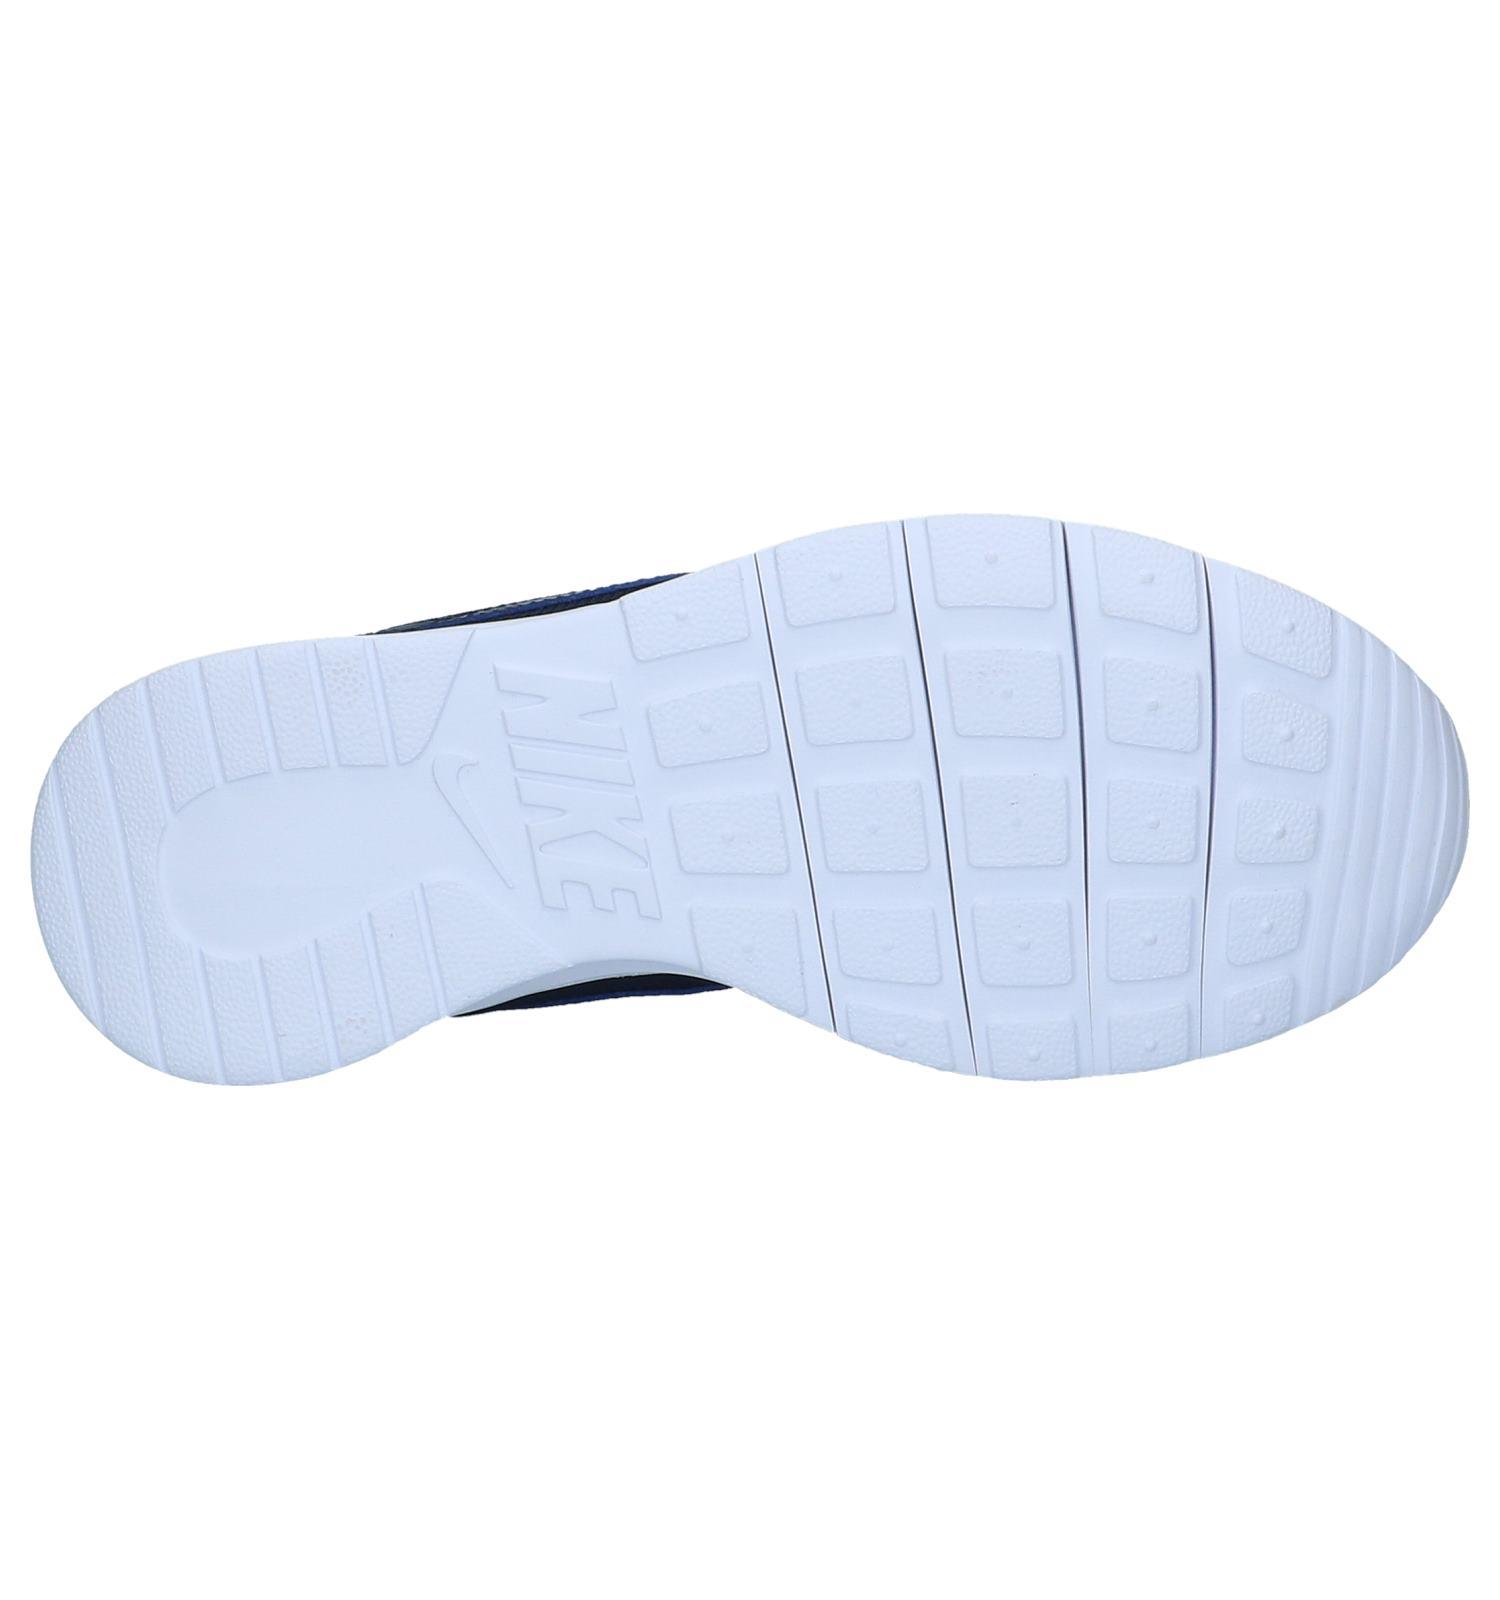 043264e040d Donkerblauwe Runners Nike Tanjun GS | TORFS.BE | Gratis verzend en retour